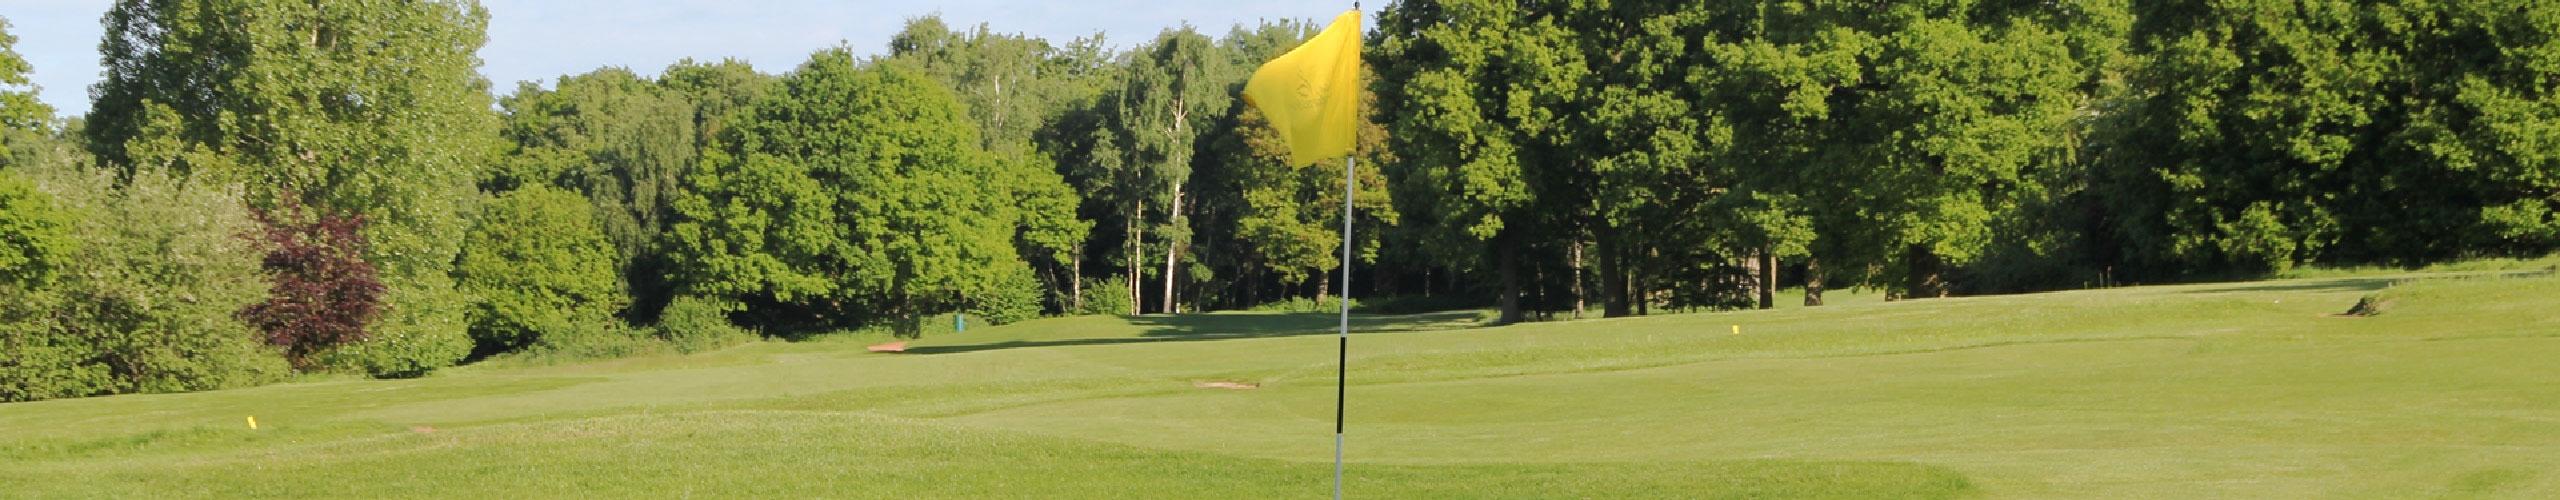 Golf course yellow flag